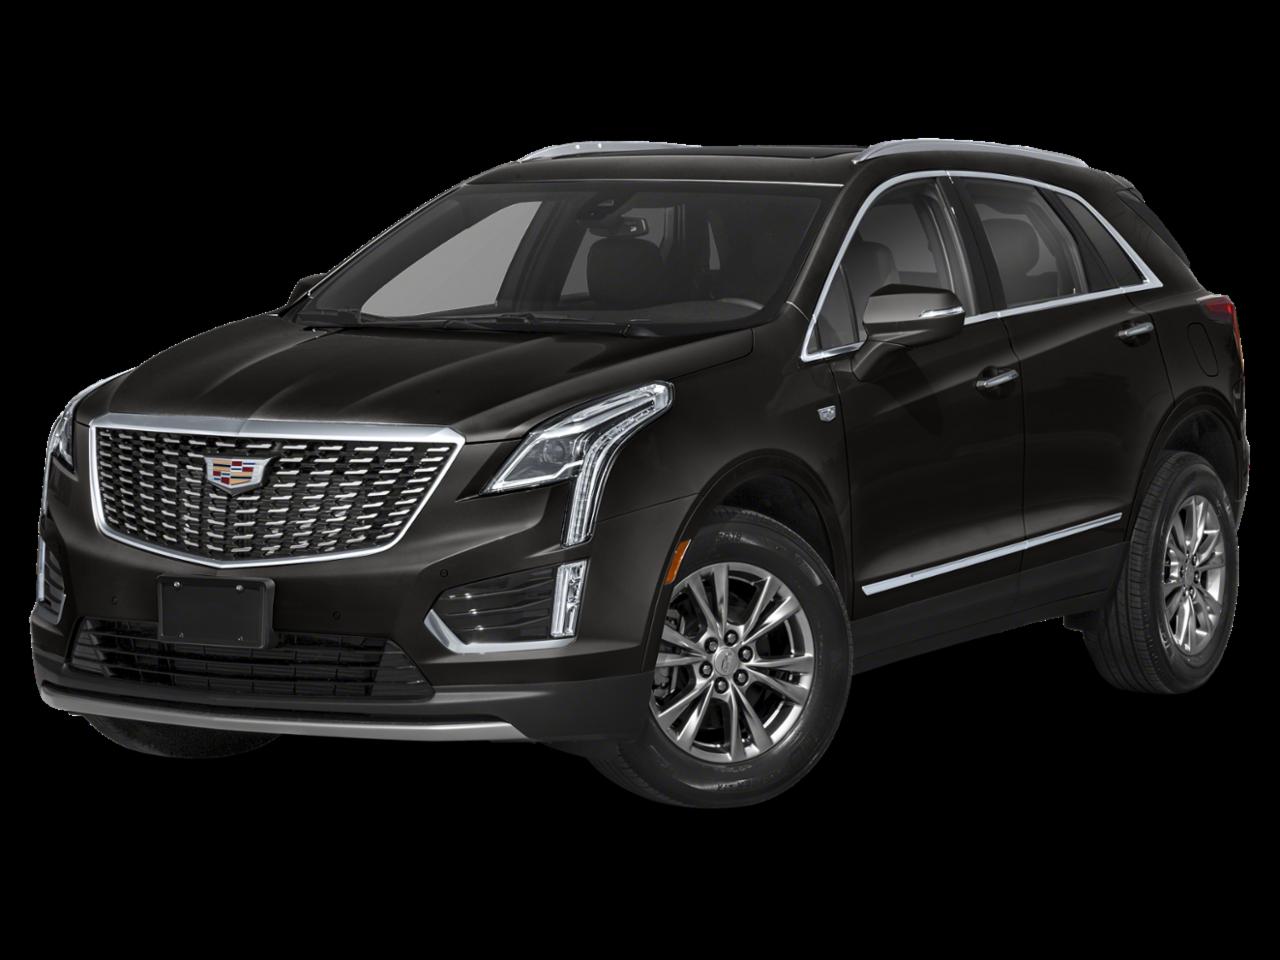 Cadillac 2020 XT5 Premium Luxury FWD